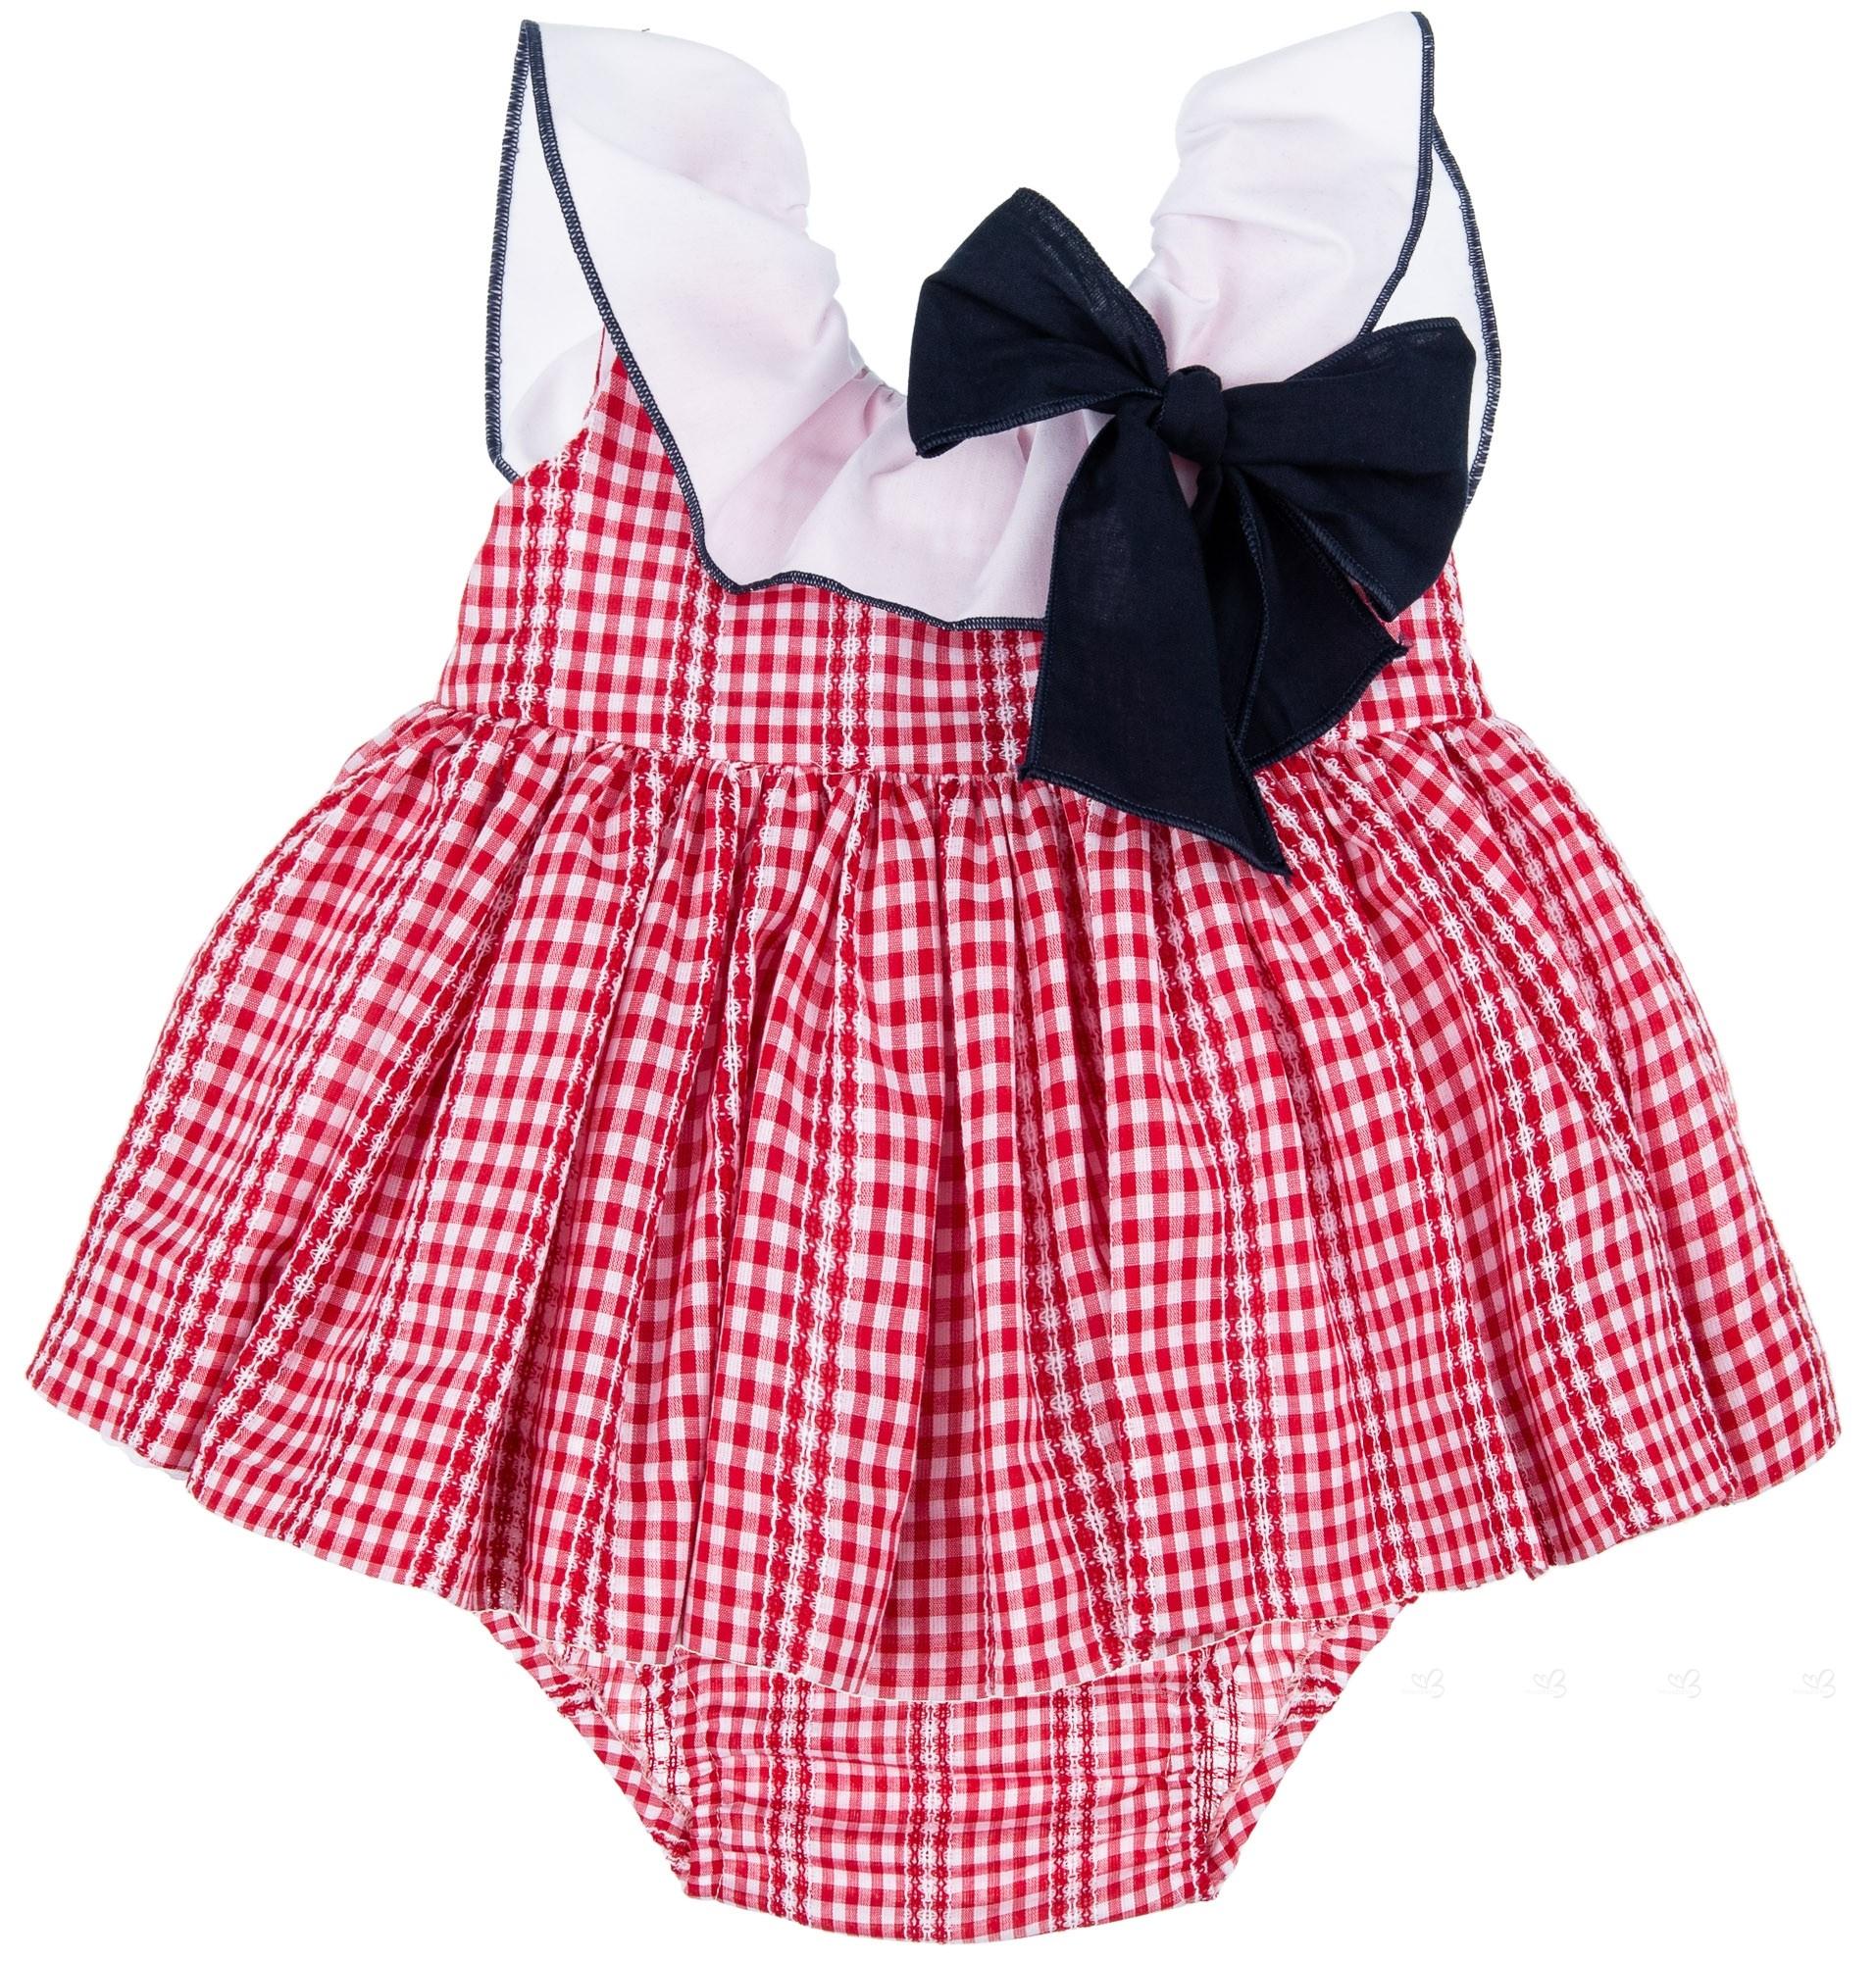 ea2728cb389 Home  Girls Red Gingham Dress   Knickers Set. Lappepa Moda Infantil  Conjunto Niña 2 Piezas Vestido Vichy Rojo   Braguita Doble Volante ...